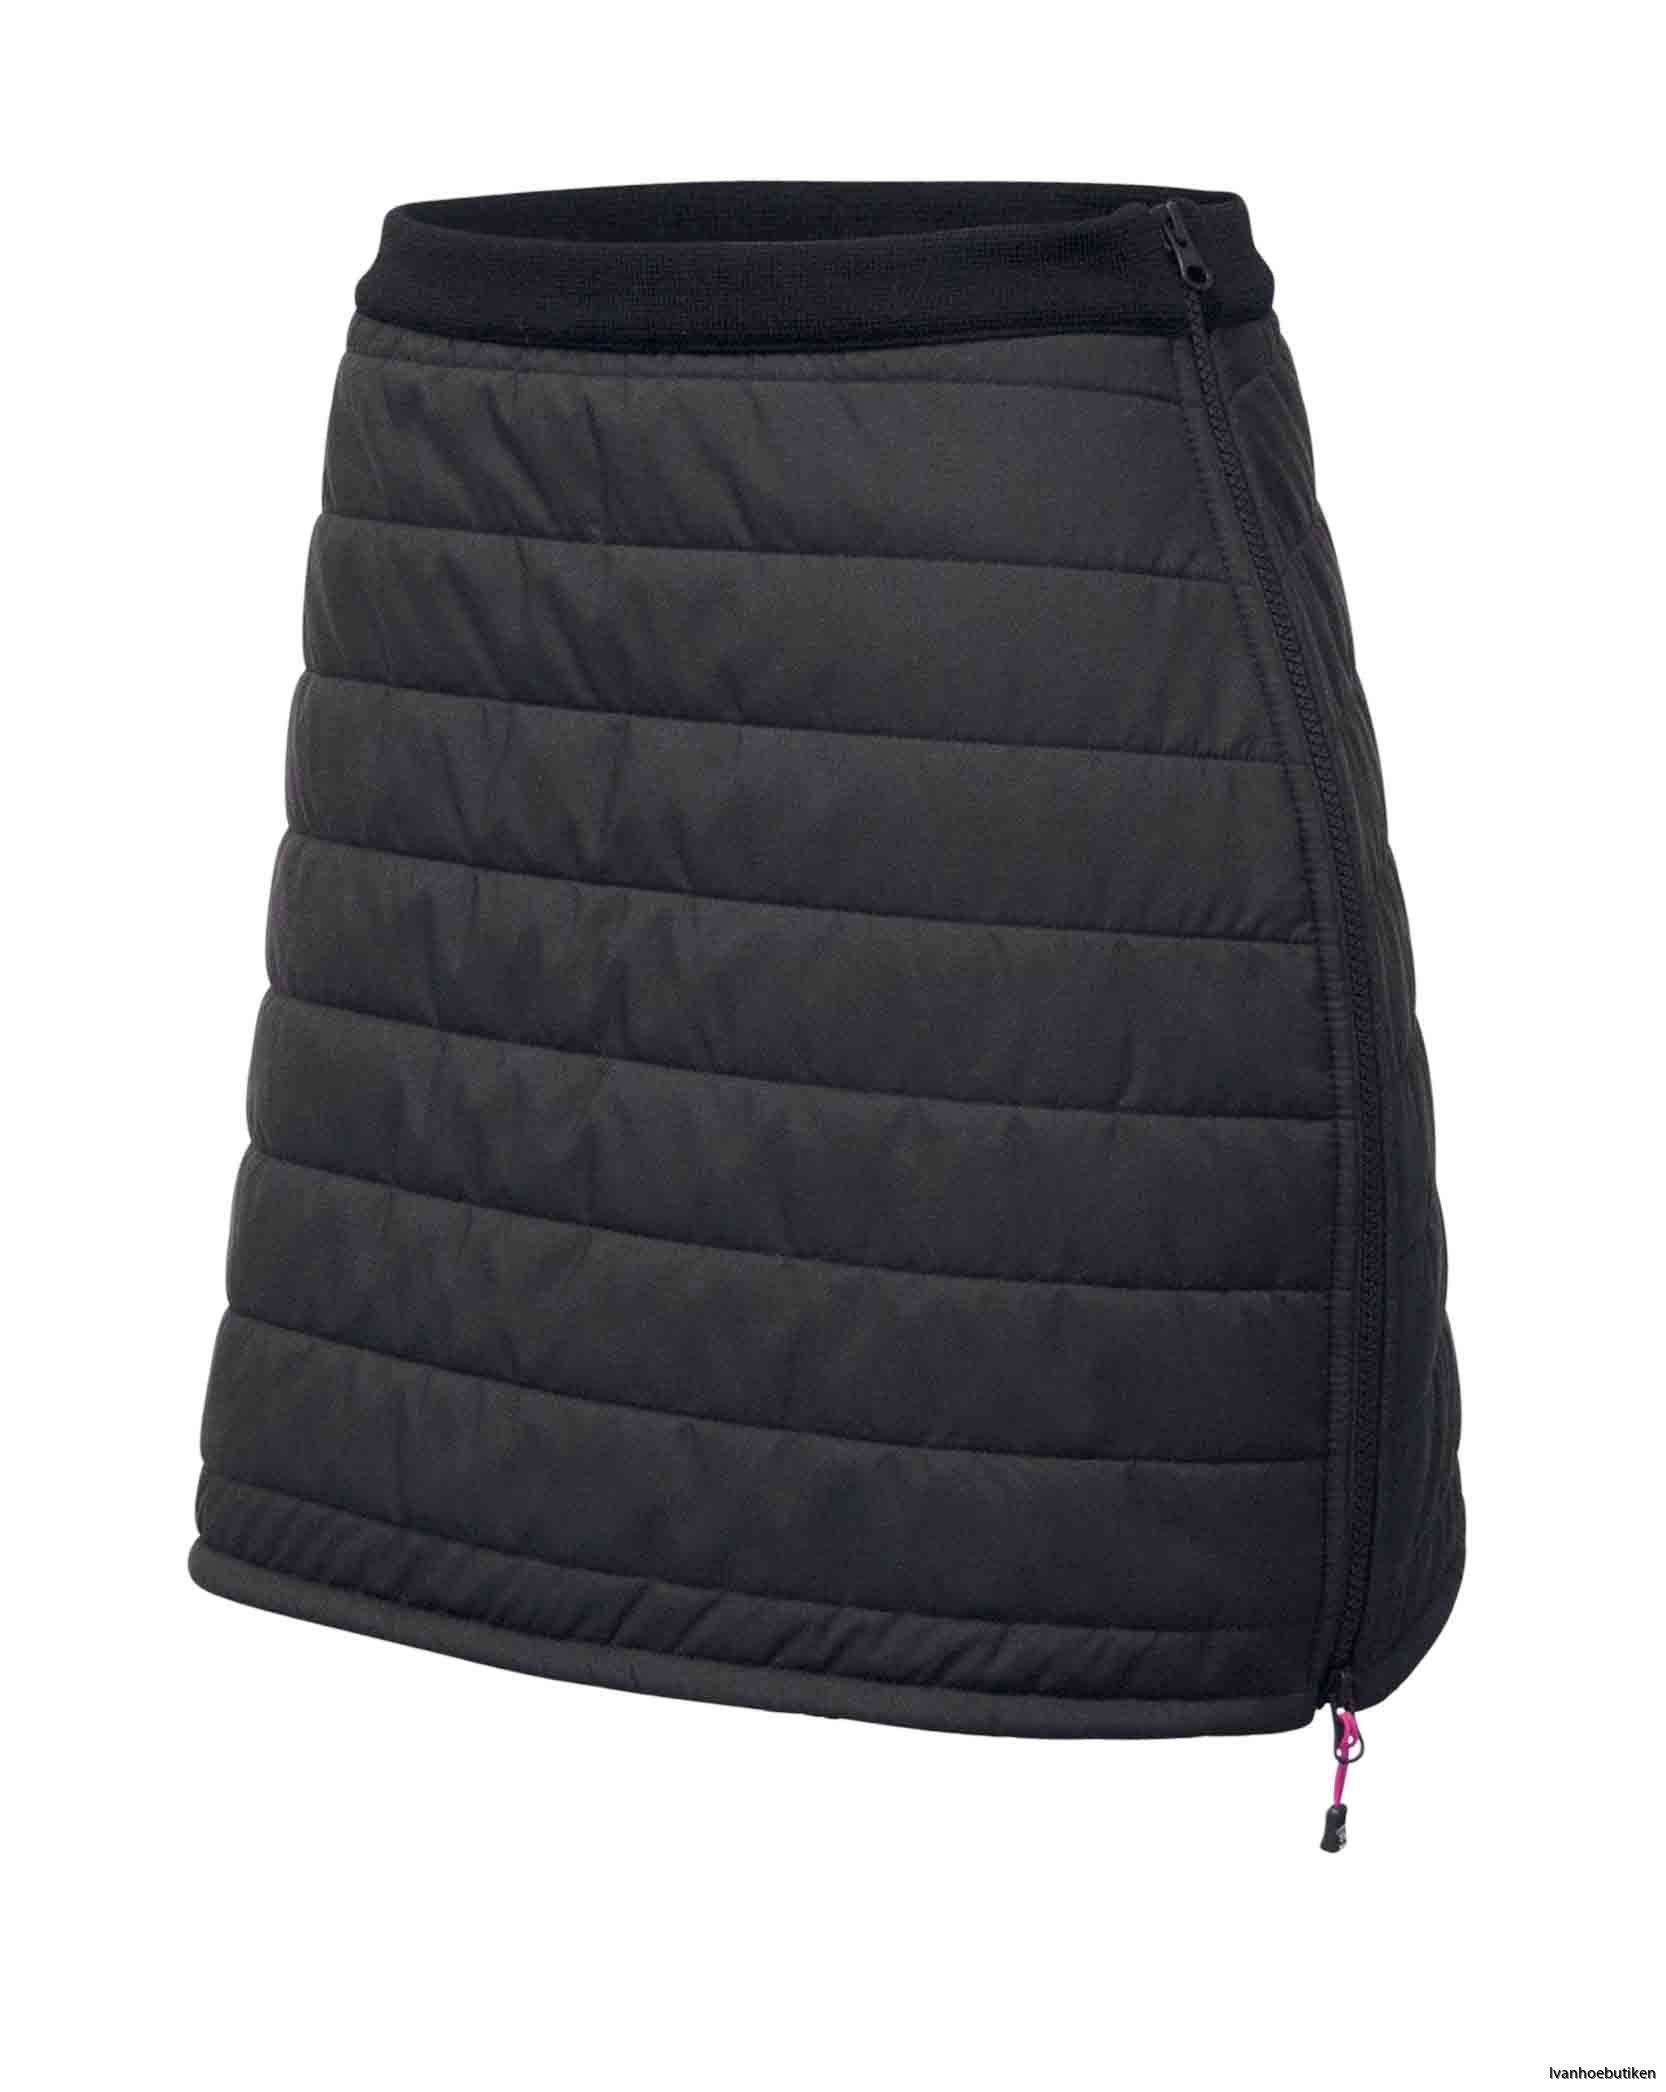 Pulsar_Short_Skirt_015_Woven_side